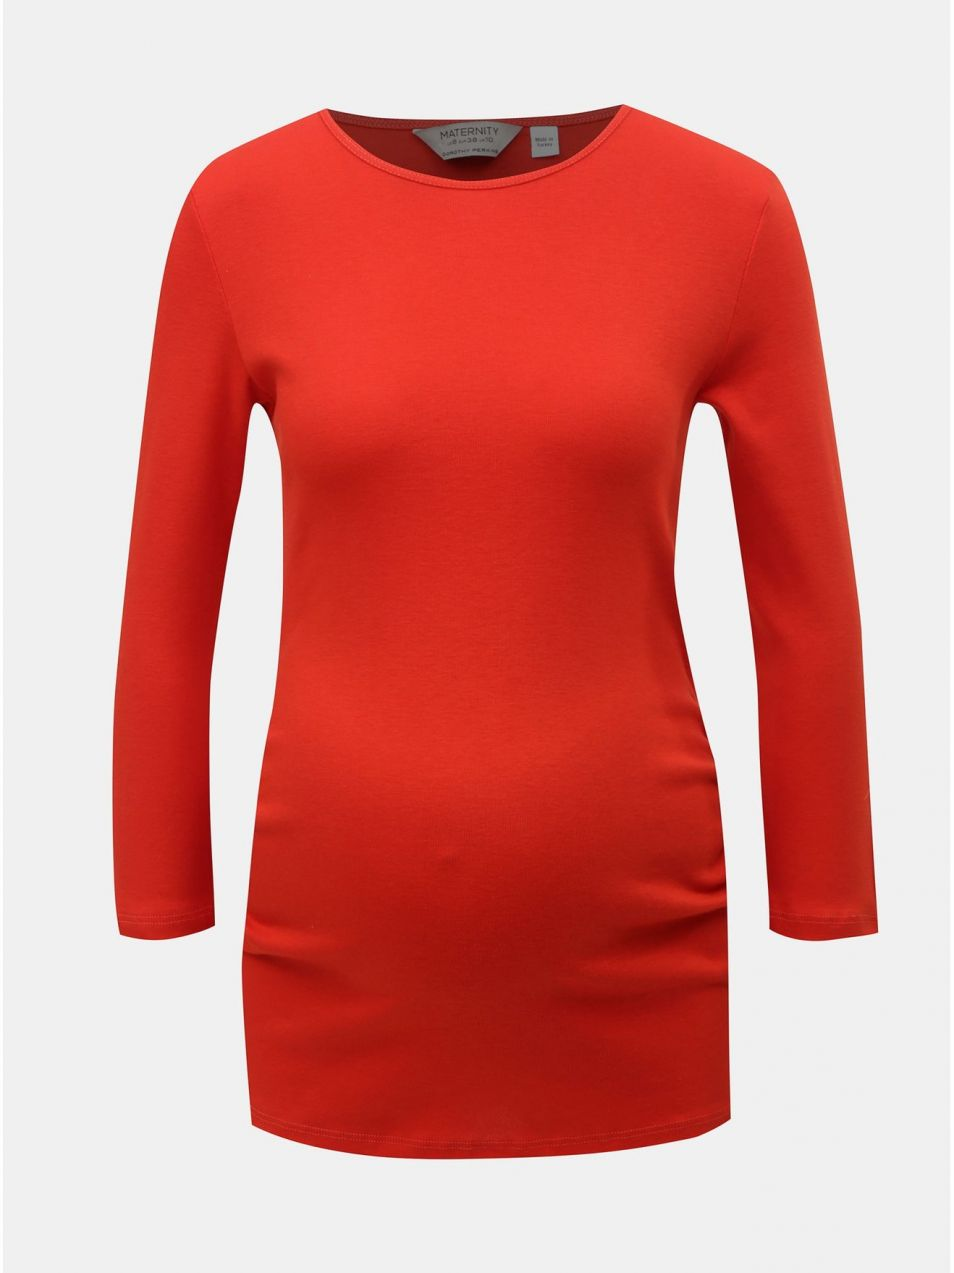 907dbb95d14f Červené tehotenské tričko s 3 4 rukávom Dorothy Perkins Maternity ...